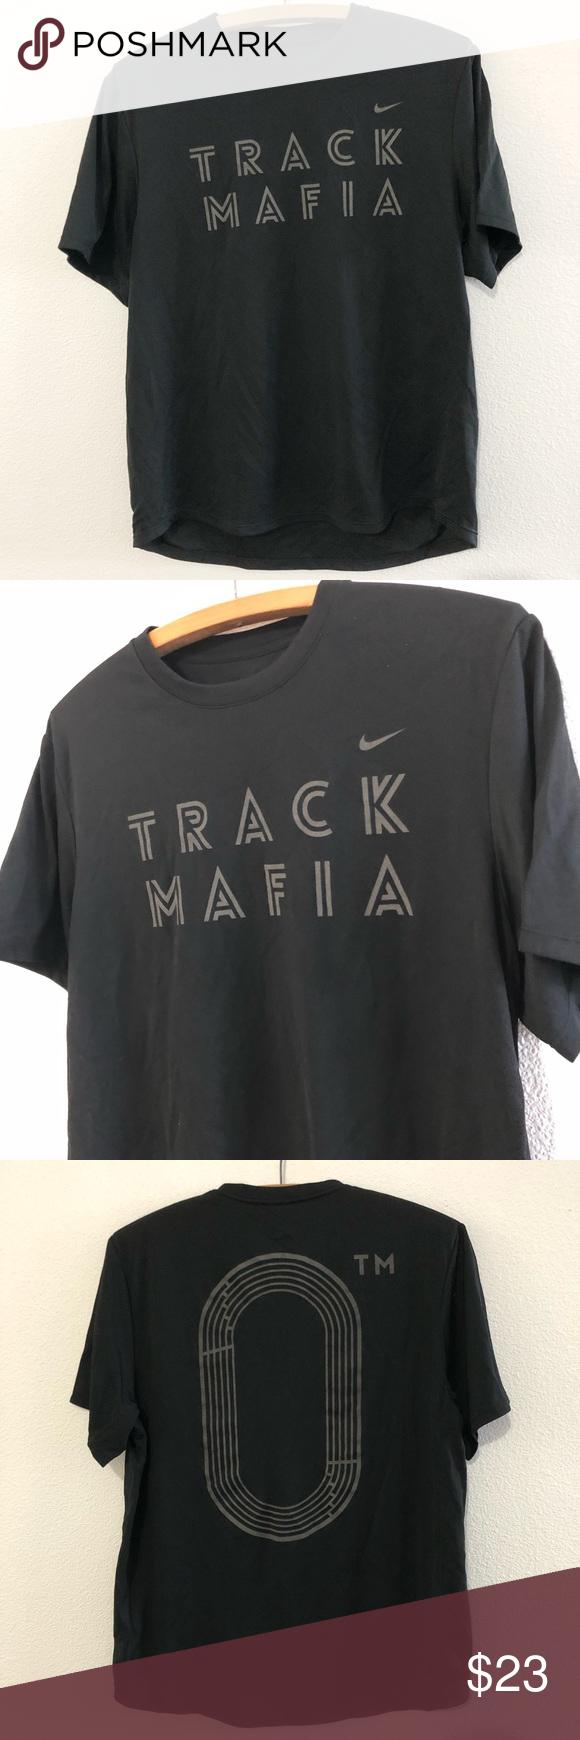 Anuncio Flexible salida  Nike Track Mafia Shirt Men's Medium | Mafia shirts, Mens shirts, Shirts